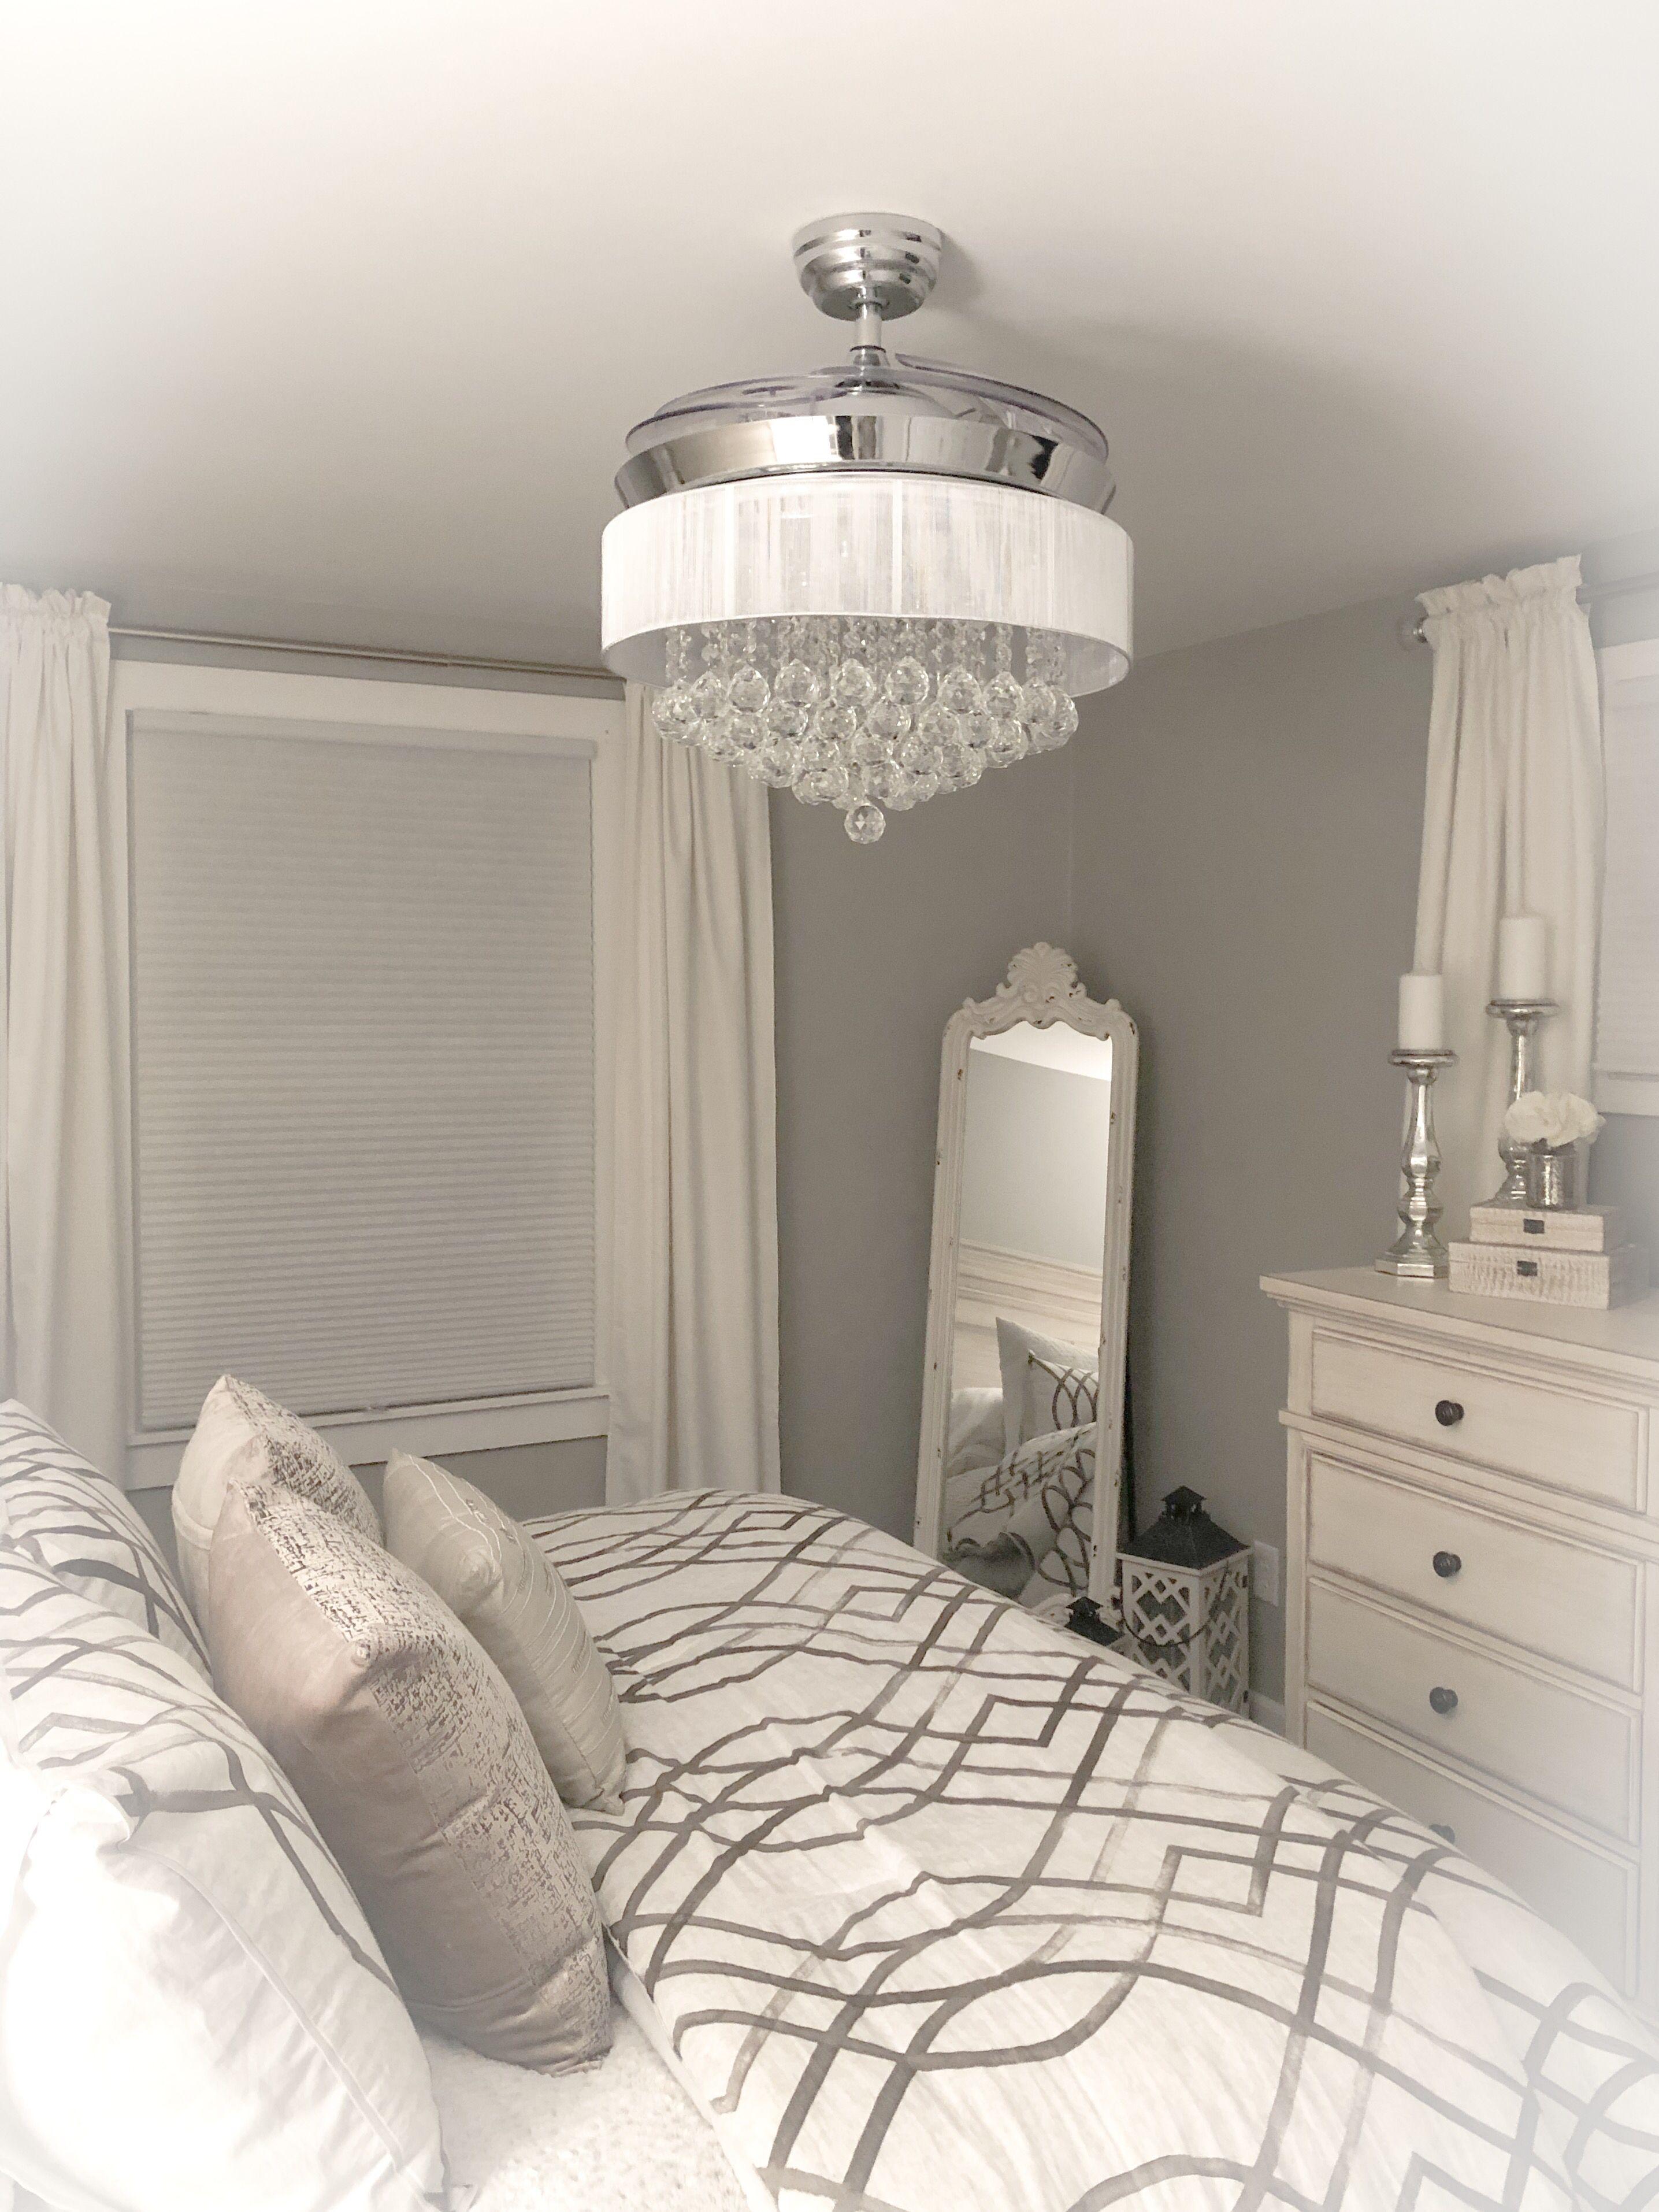 Pin By The Edesign Platform On Bedroom Design Inspiration Interior Design Bedroom Design Inspiration Glam Interior Design Interior Deisgn